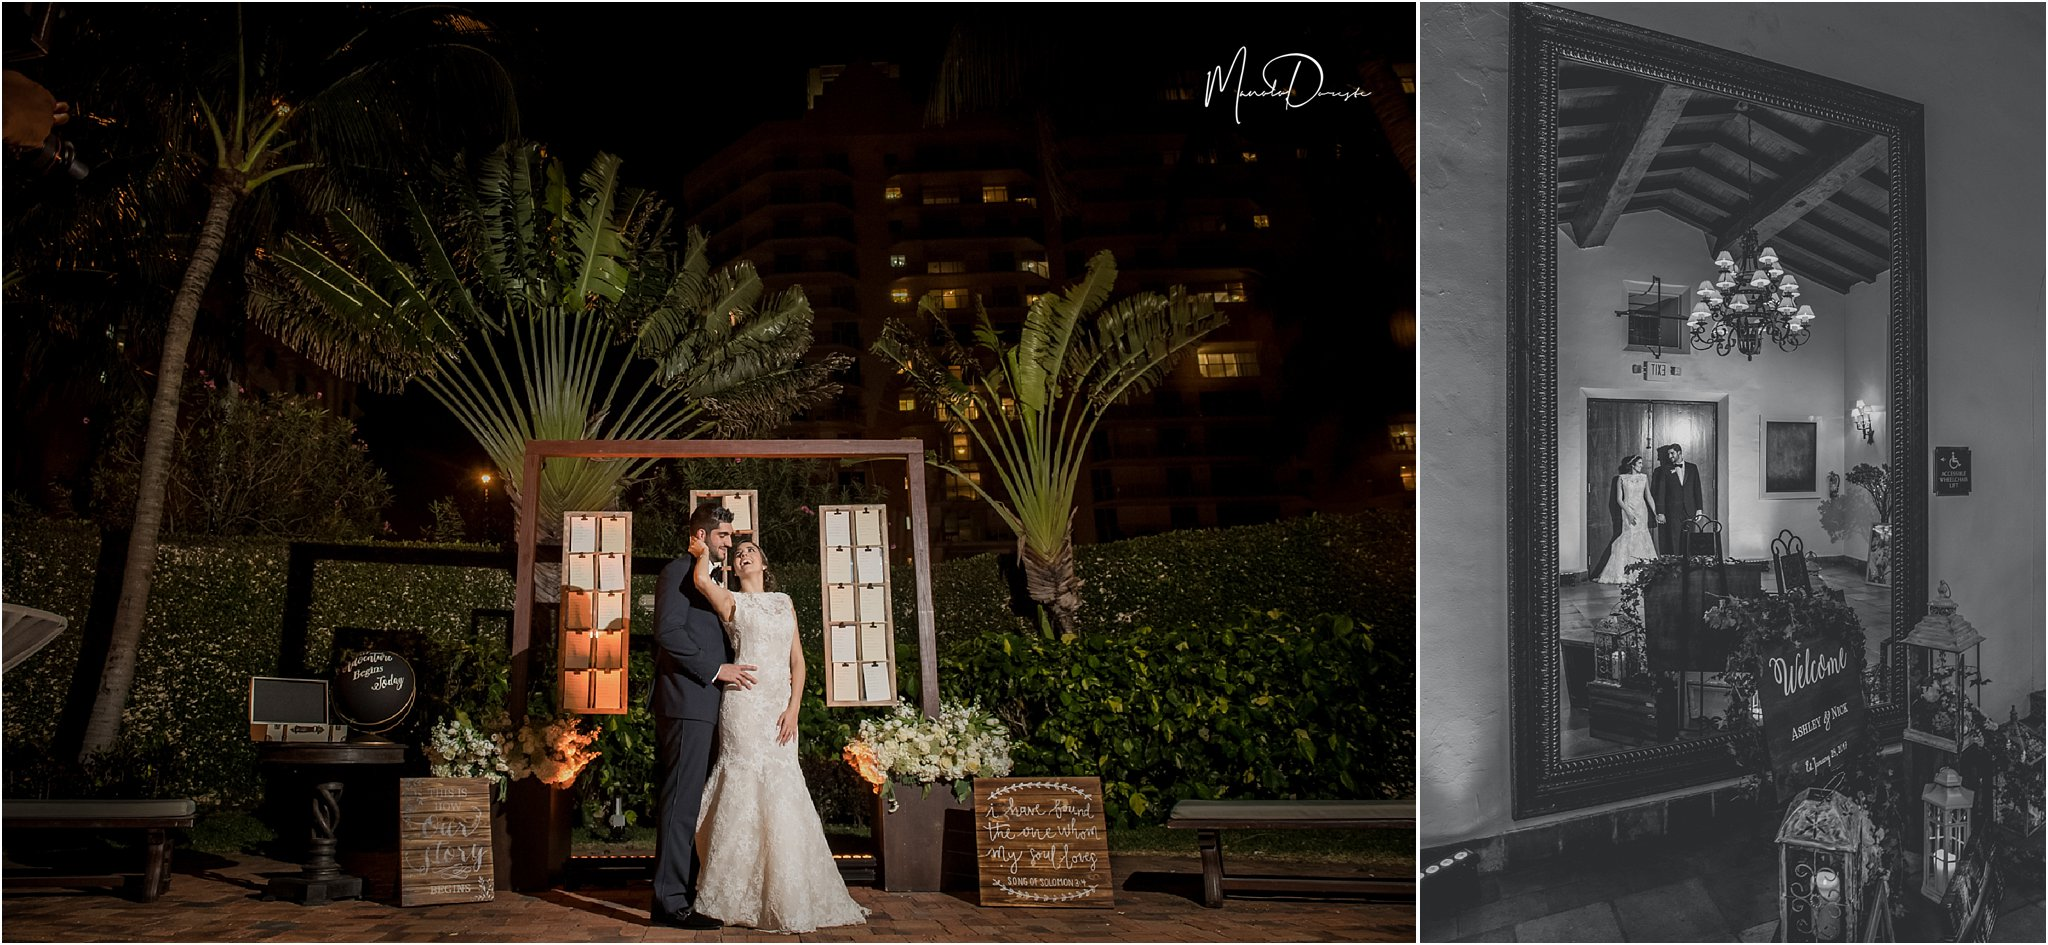 00950_ManoloDoreste_InFocusStudios_Wedding_Family_Photography_Miami_MiamiPhotographer.jpg